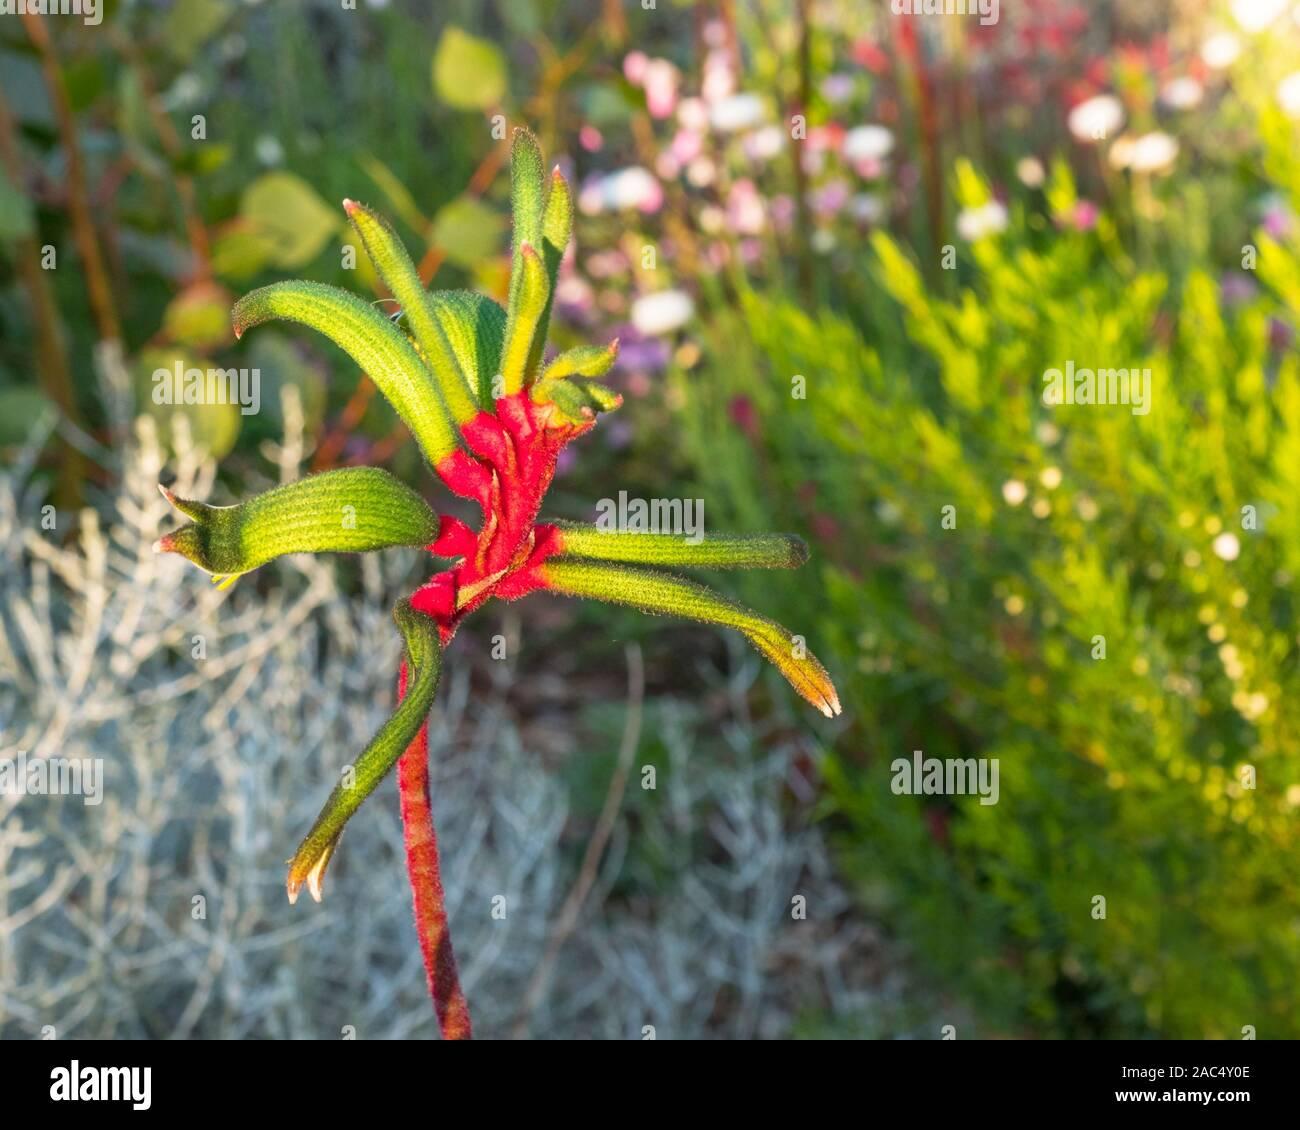 A Kangaroo Paw Flower Growing In Kings Park In Perth Western Australia Stock Photo Alamy